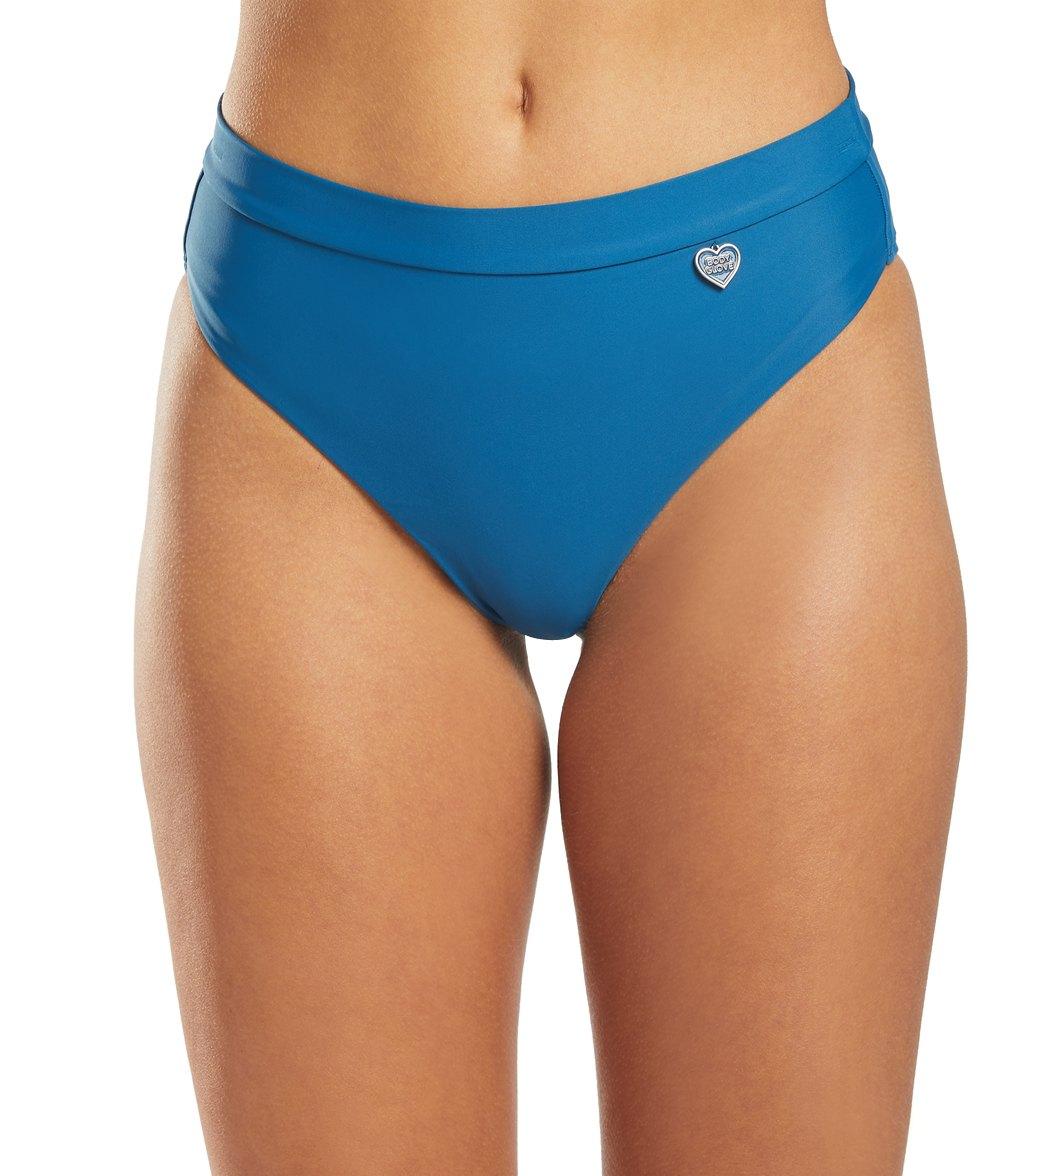 Body Glove Smoothies Marlee Bikini Bottom